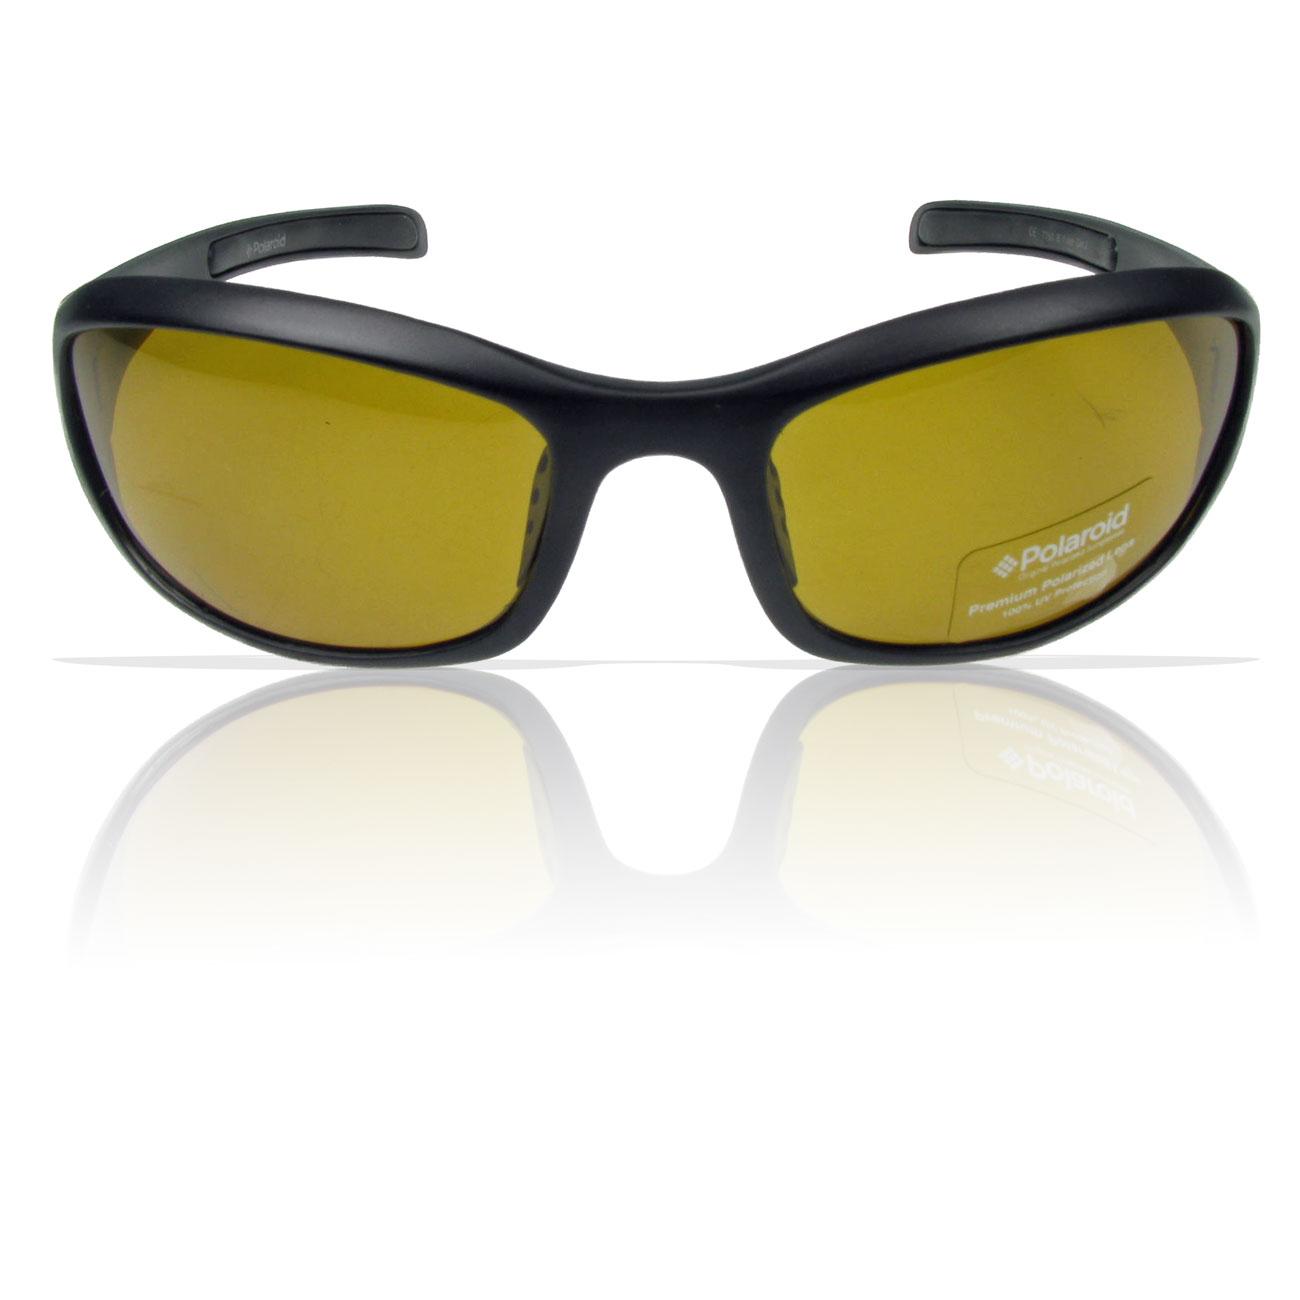 66b585f213e Best Driving Sunglasses Polarized « Heritage Malta